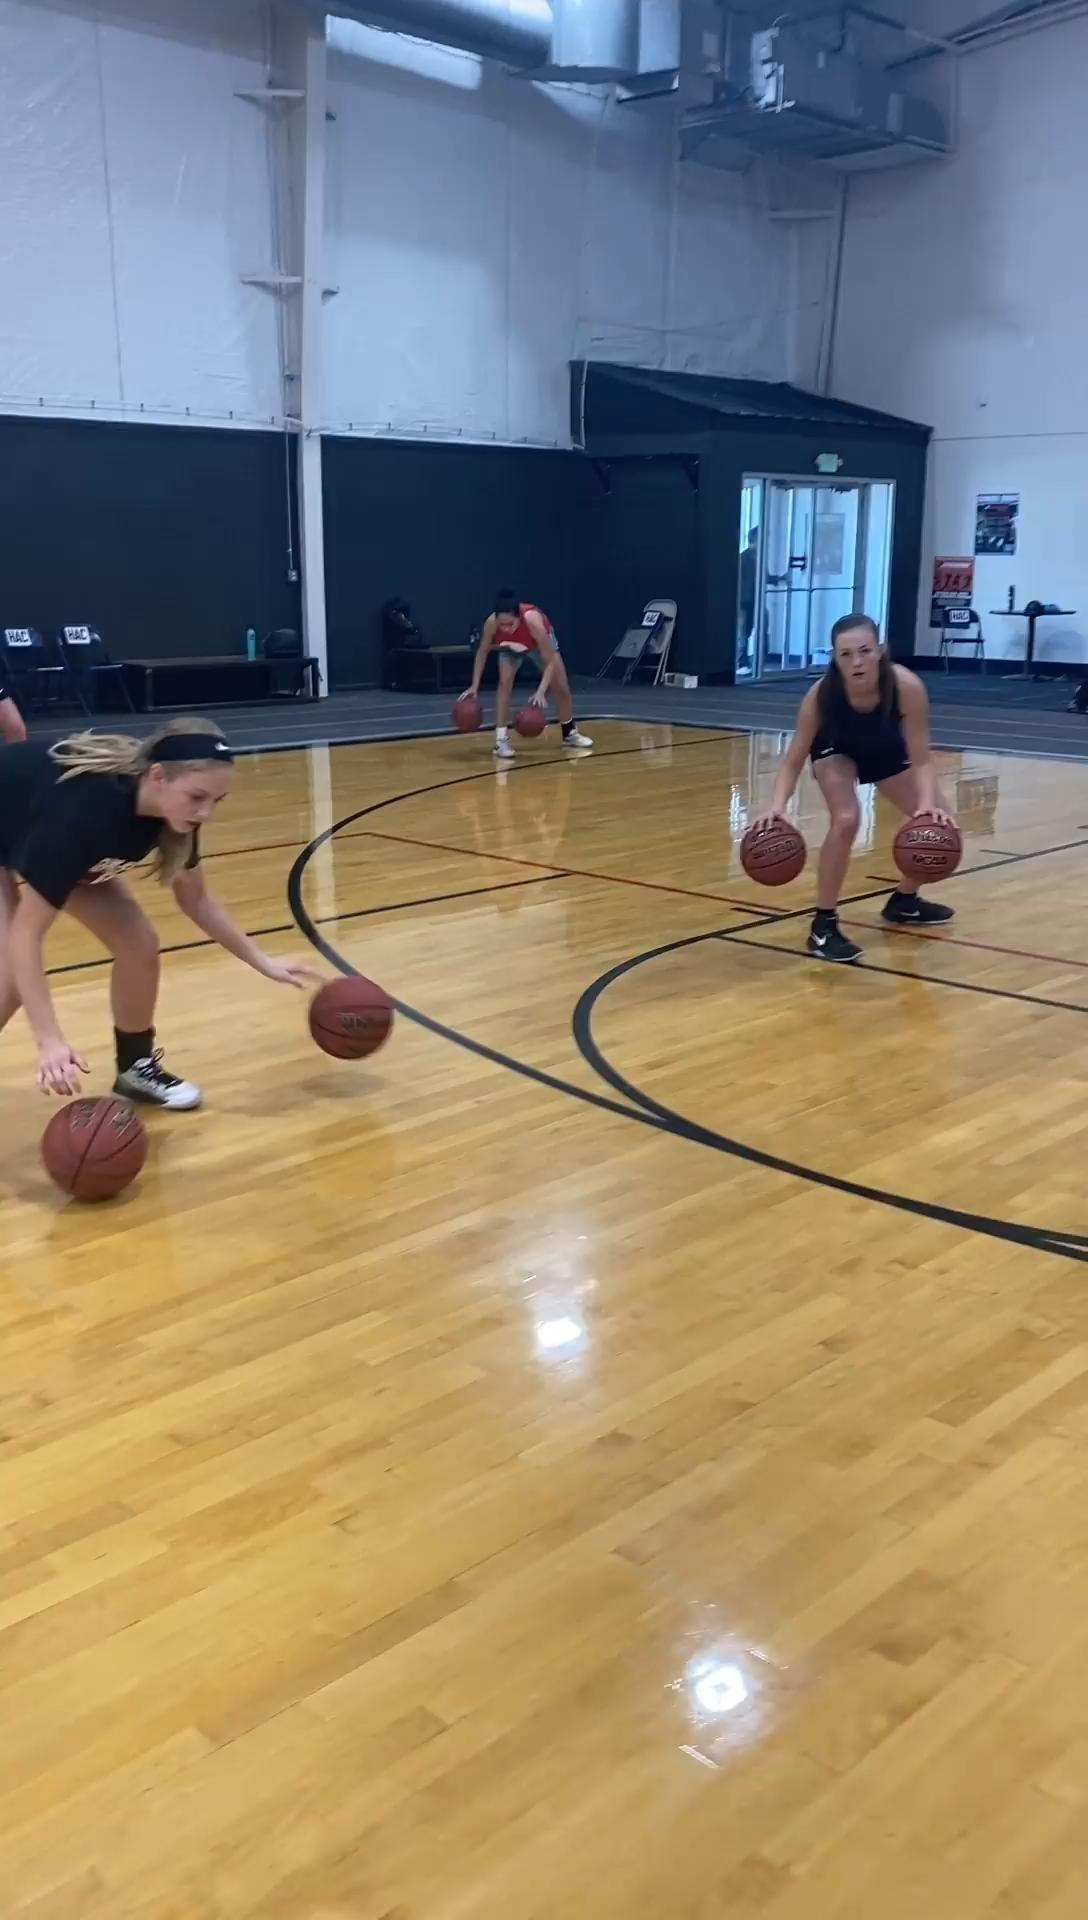 Fun Basketball Drills For Kids Parenting Advice Basketball Drills For Kids Basketball Games For Kids Fun Basketball Drills